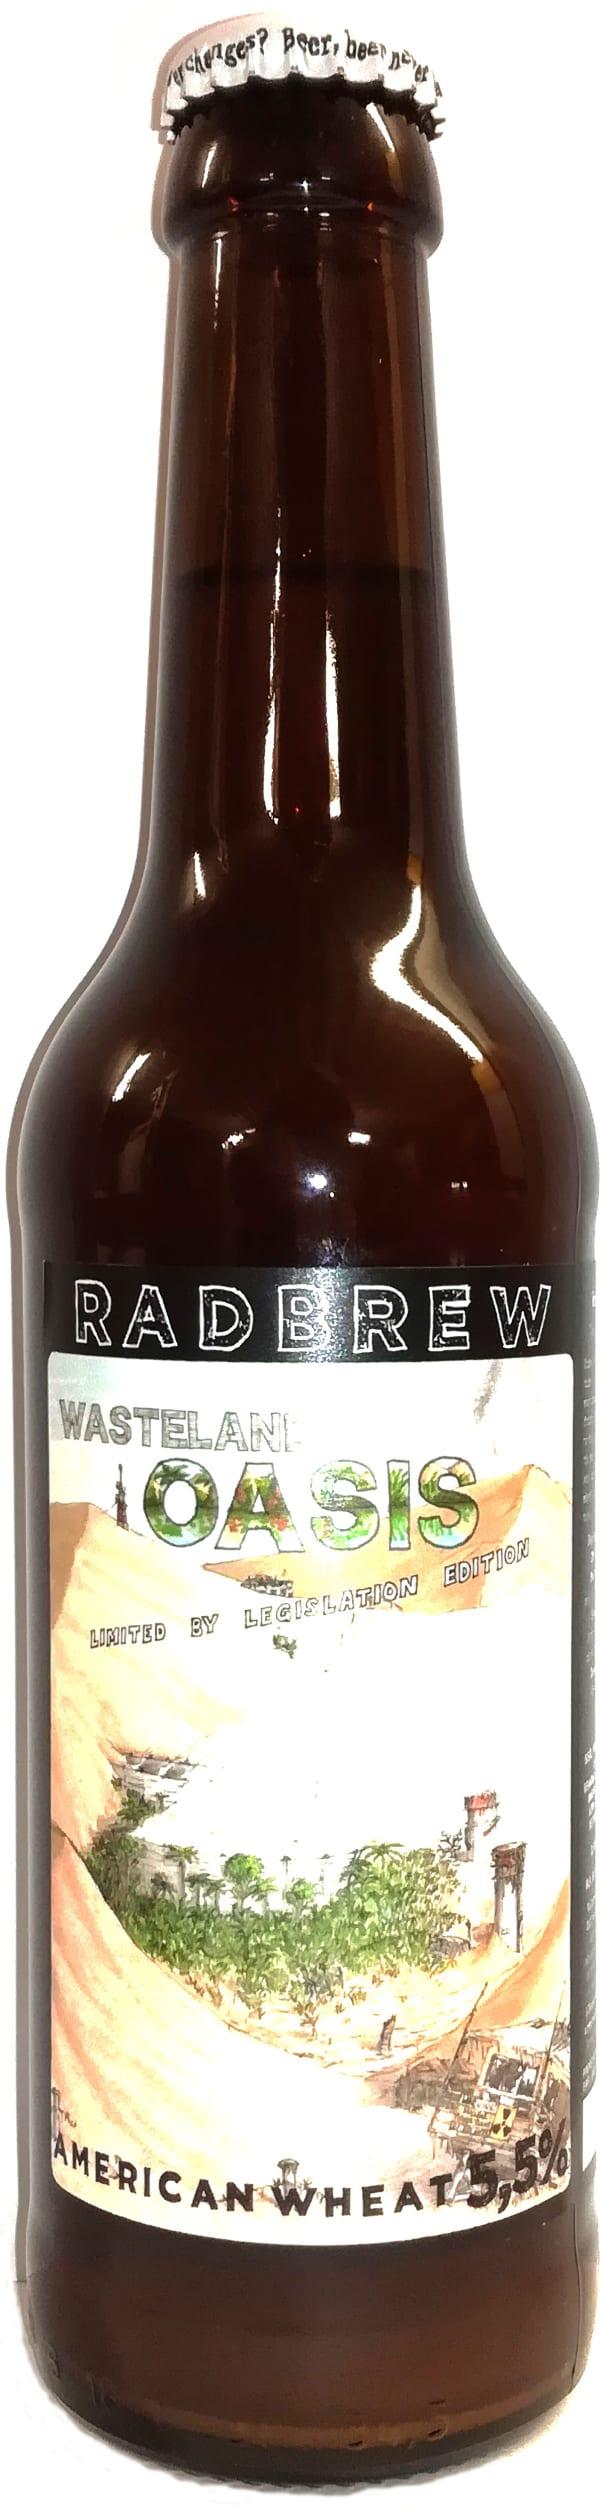 Radbrew Wasteland Oasis American Wheat